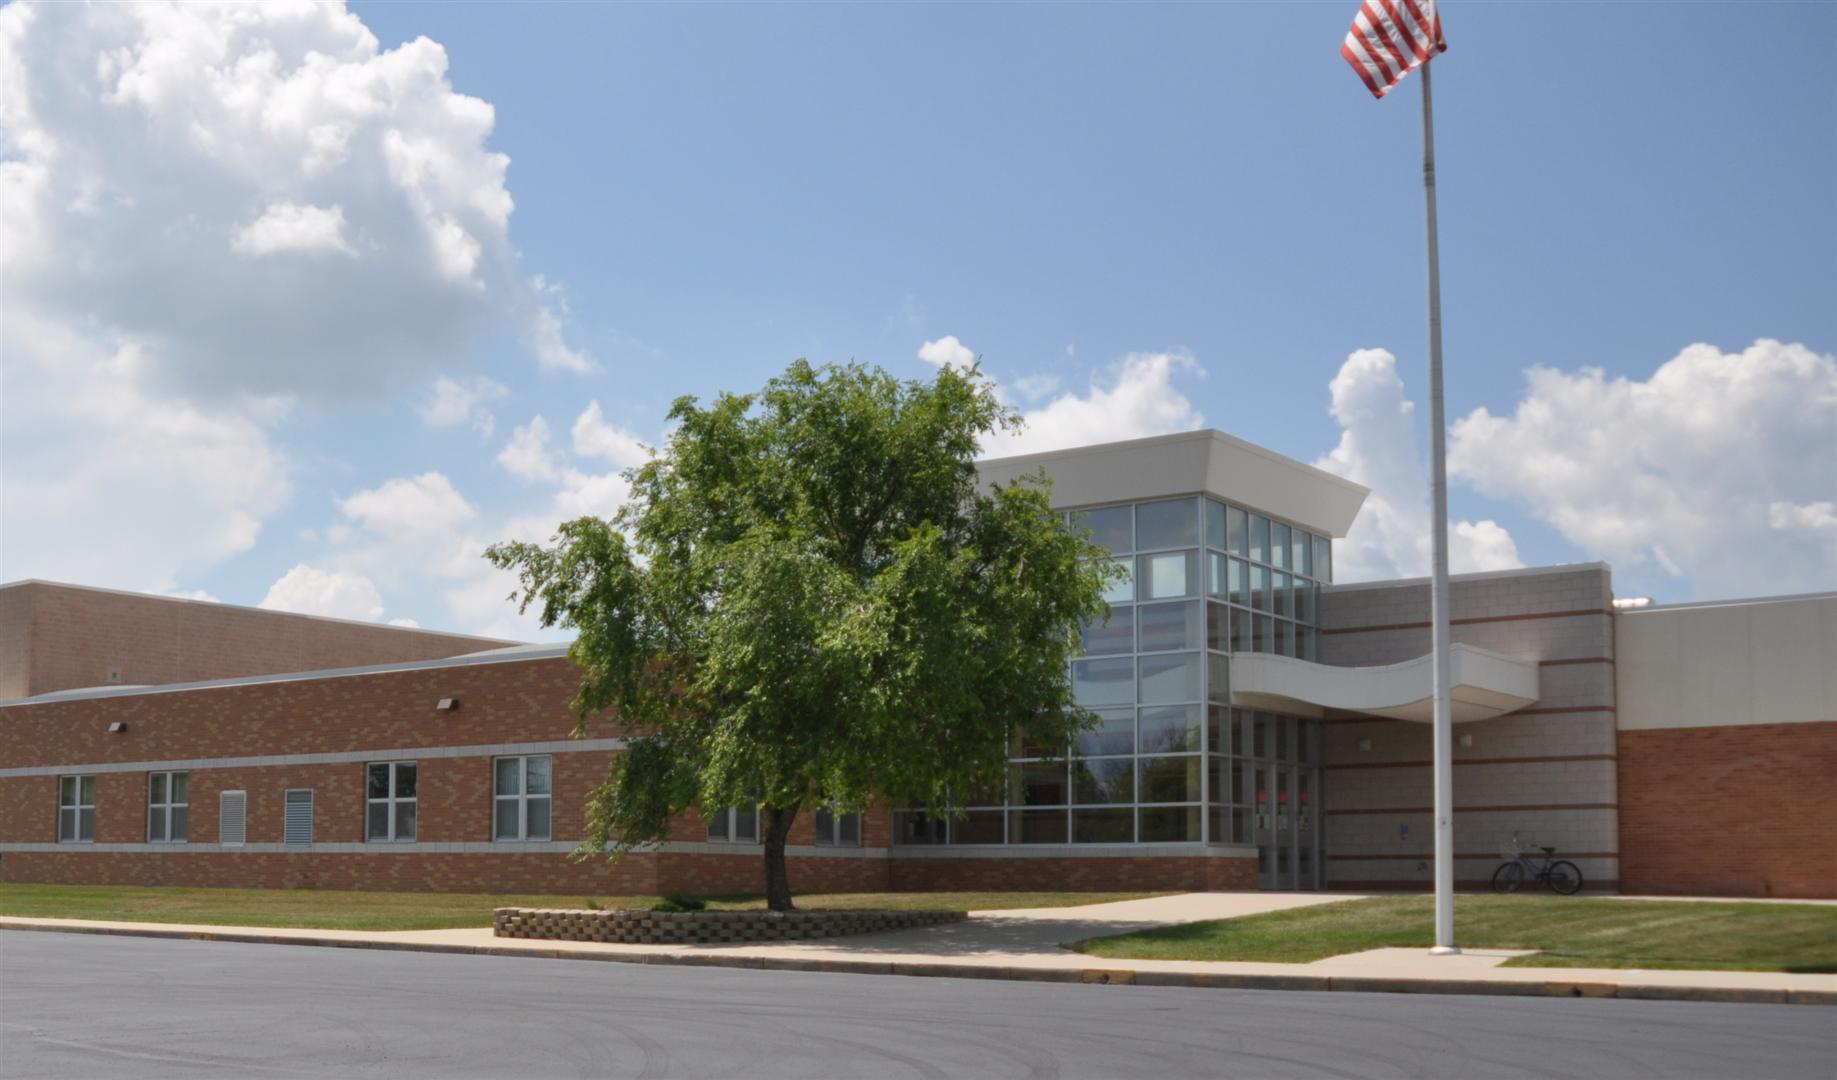 Picture of Harbor Beach Community School Building